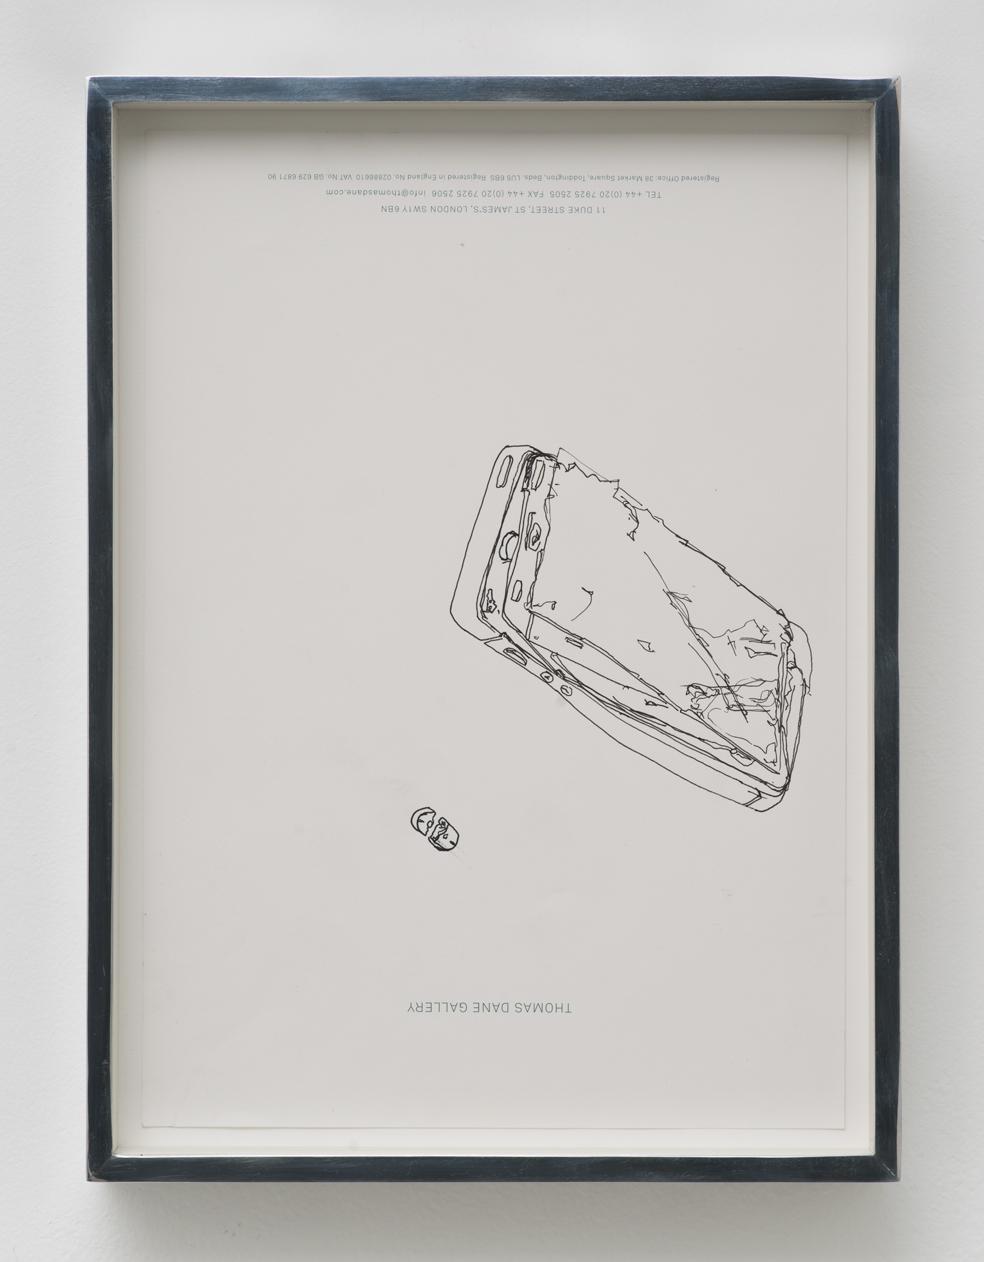 iPhone 5 A1429/Adderall, Amphetamine and Dextroamphetamine 10 mg, cor 132, Round, Multi-Segmented, Core Pharmaceuticals, Inc.: Thomas Dane Gallery, London, United Kingdom, September 27, 2014   2014  Ink on letterhead  12 7/8 x 9 1/2 inches   Drawings, 2014–    Walid AlBeshti, 2015    Atopolis, 2015